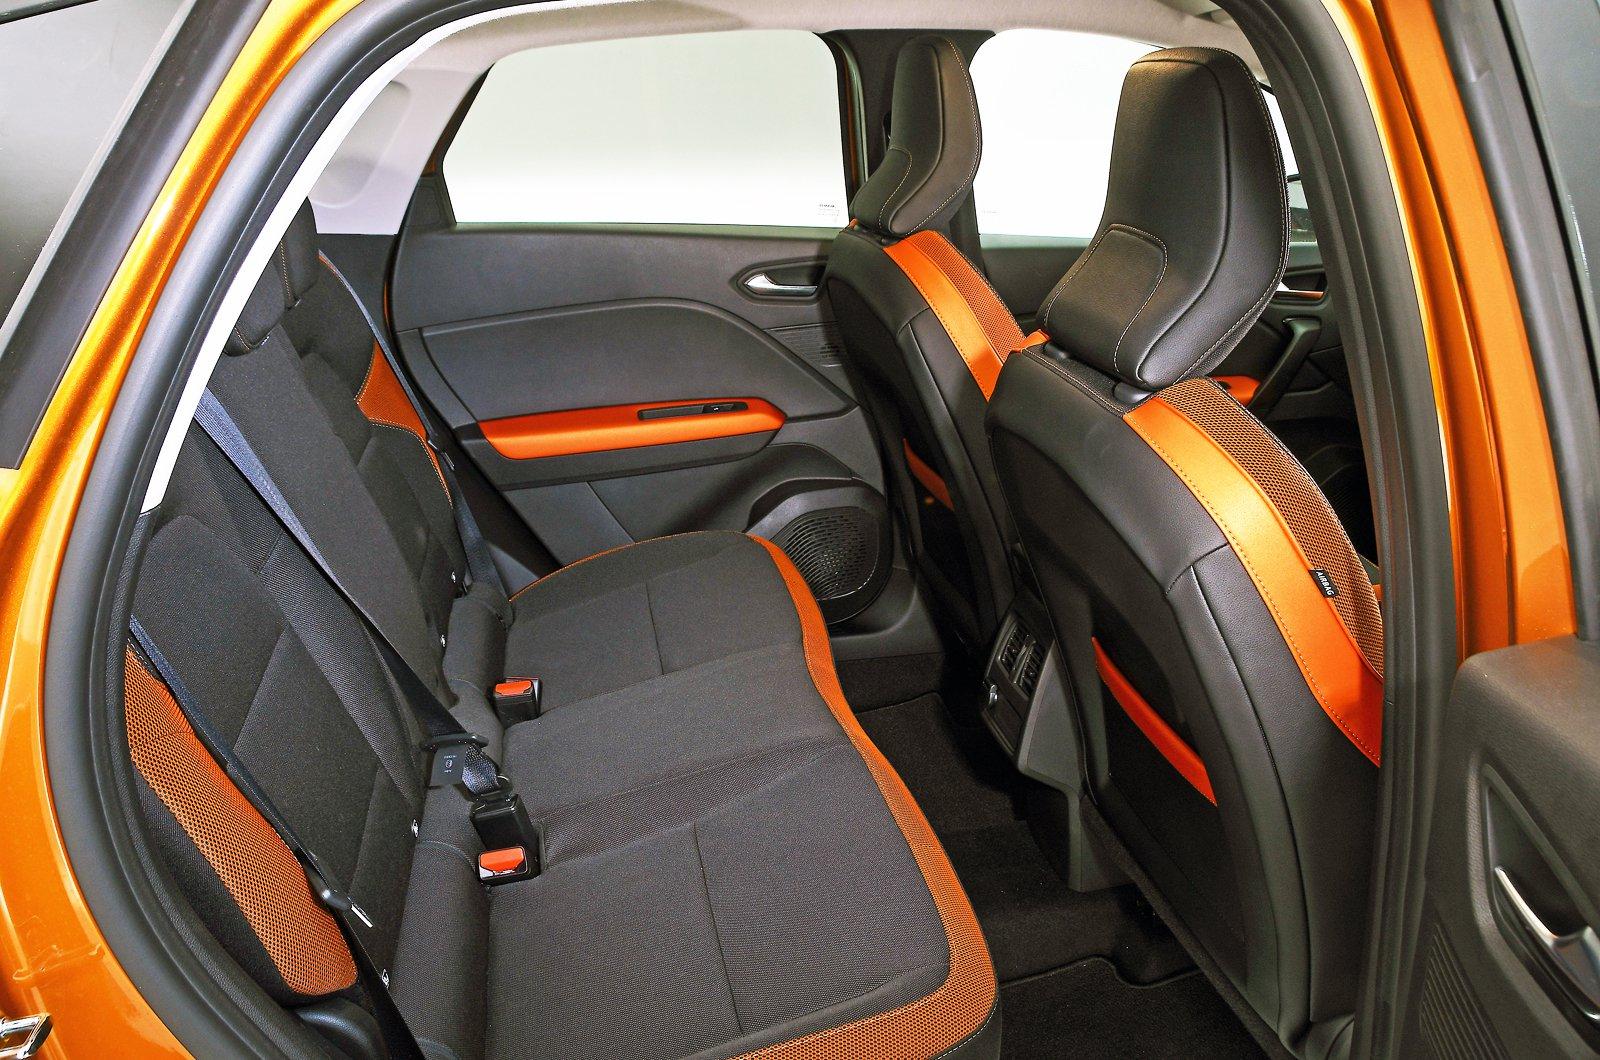 Renault Captur rear seats - orange 69-plate car